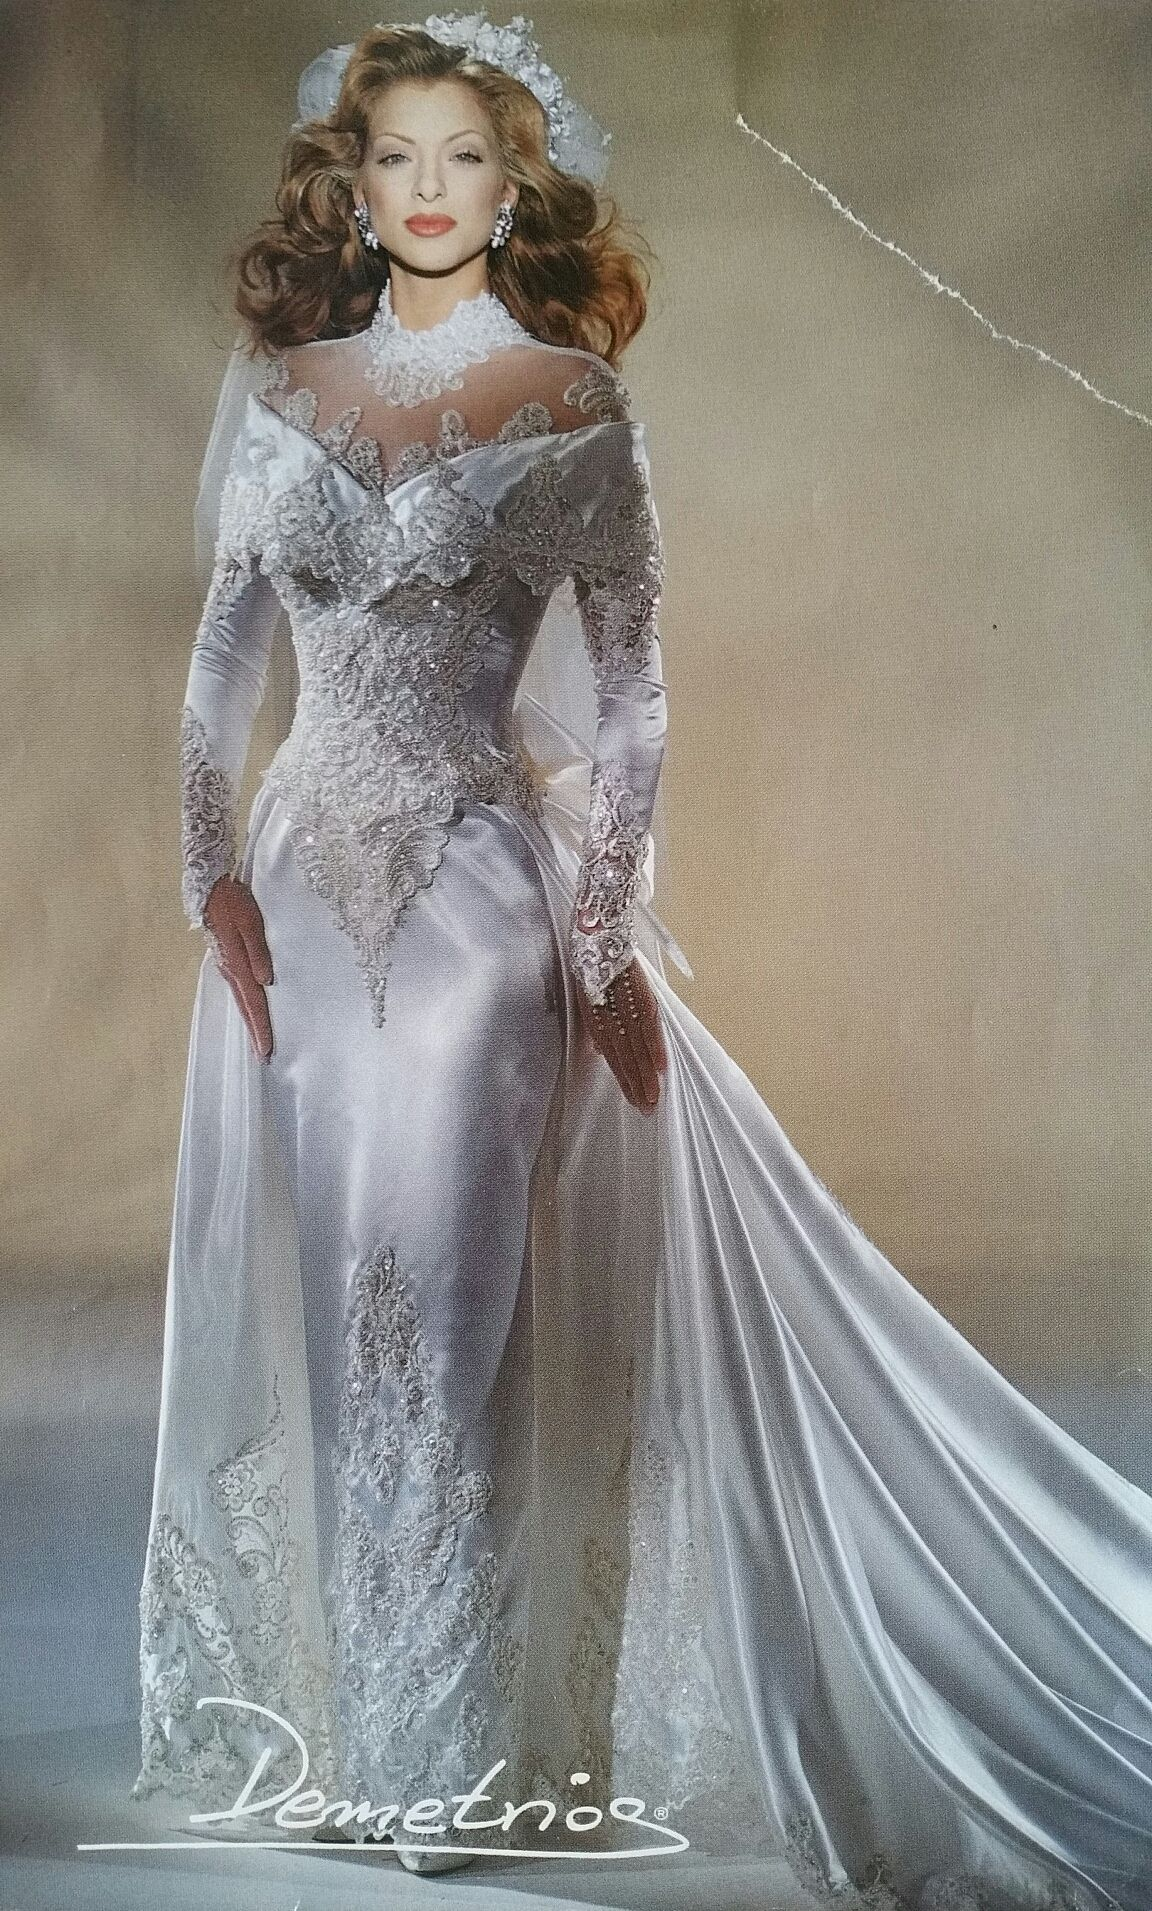 Demetrios stunning bridal dresses pinterest wedding dress